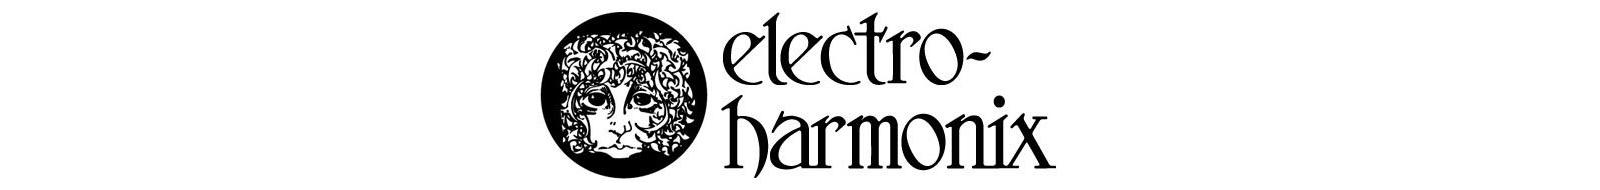 Electro-Harmonix Effects Pedals